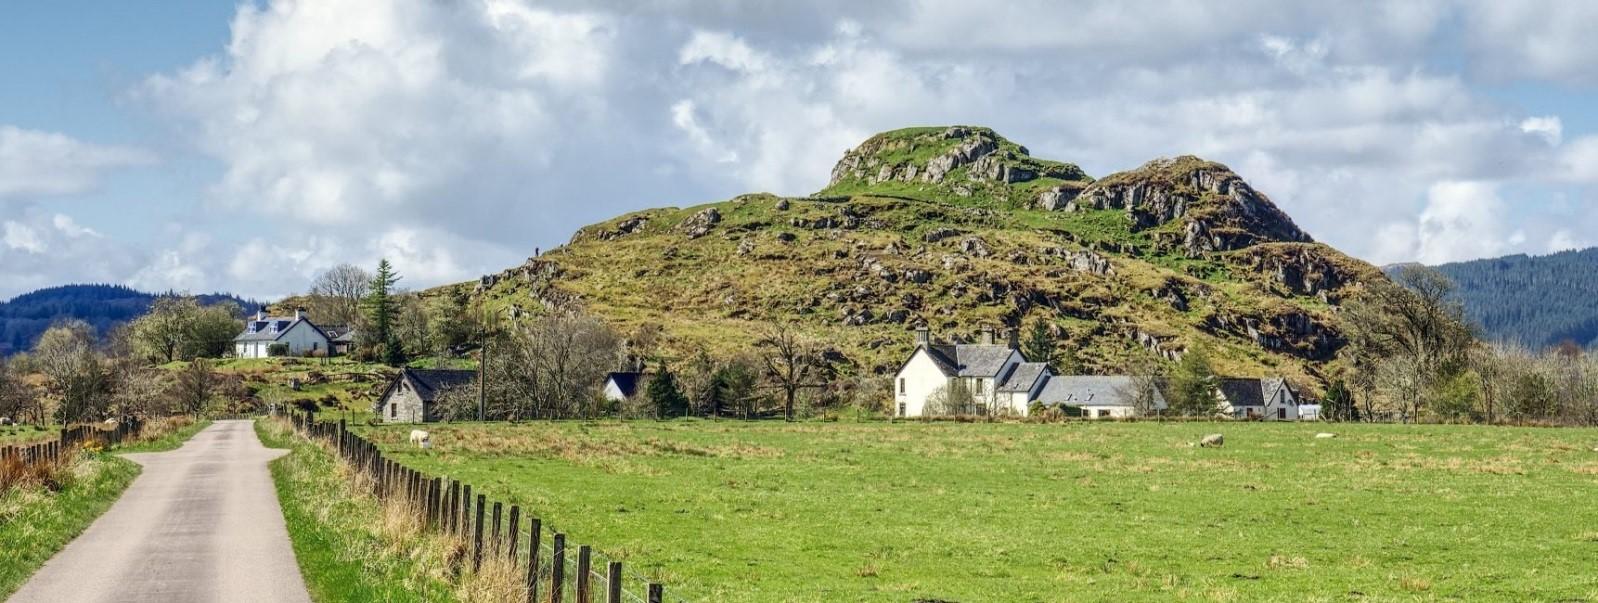 Dalriada, Alba, Scotland - McLean Scotland